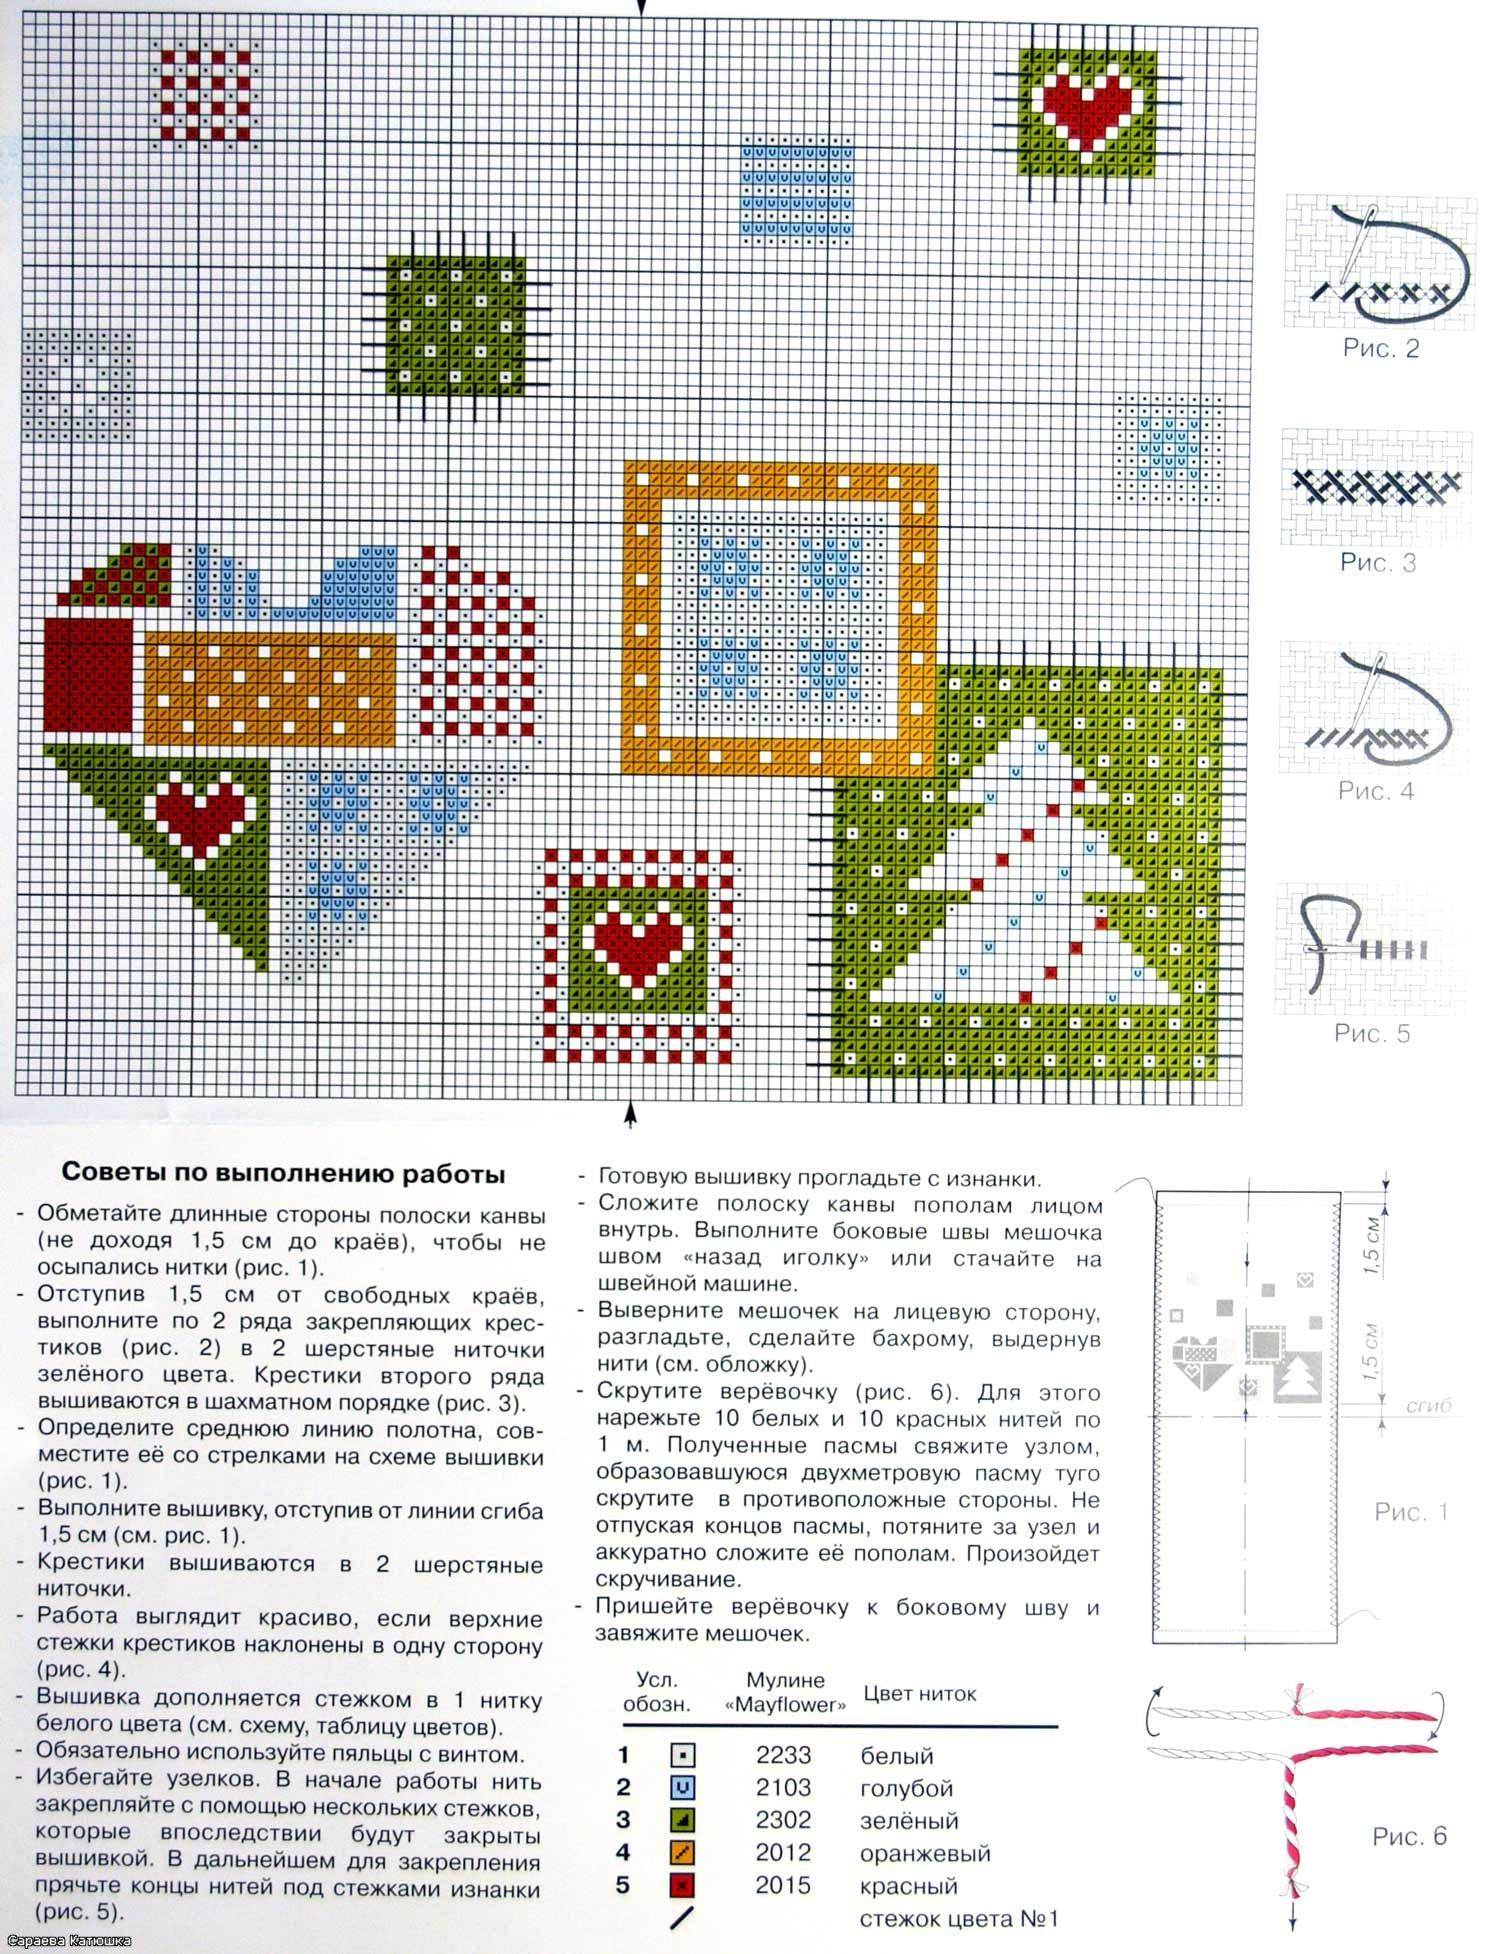 http://craft-craft.net/wp-content/uploads/2011/12/christmas-craft-ideas-embroidered-gift-bag-craft-craft-20cd338989c6a.jpg